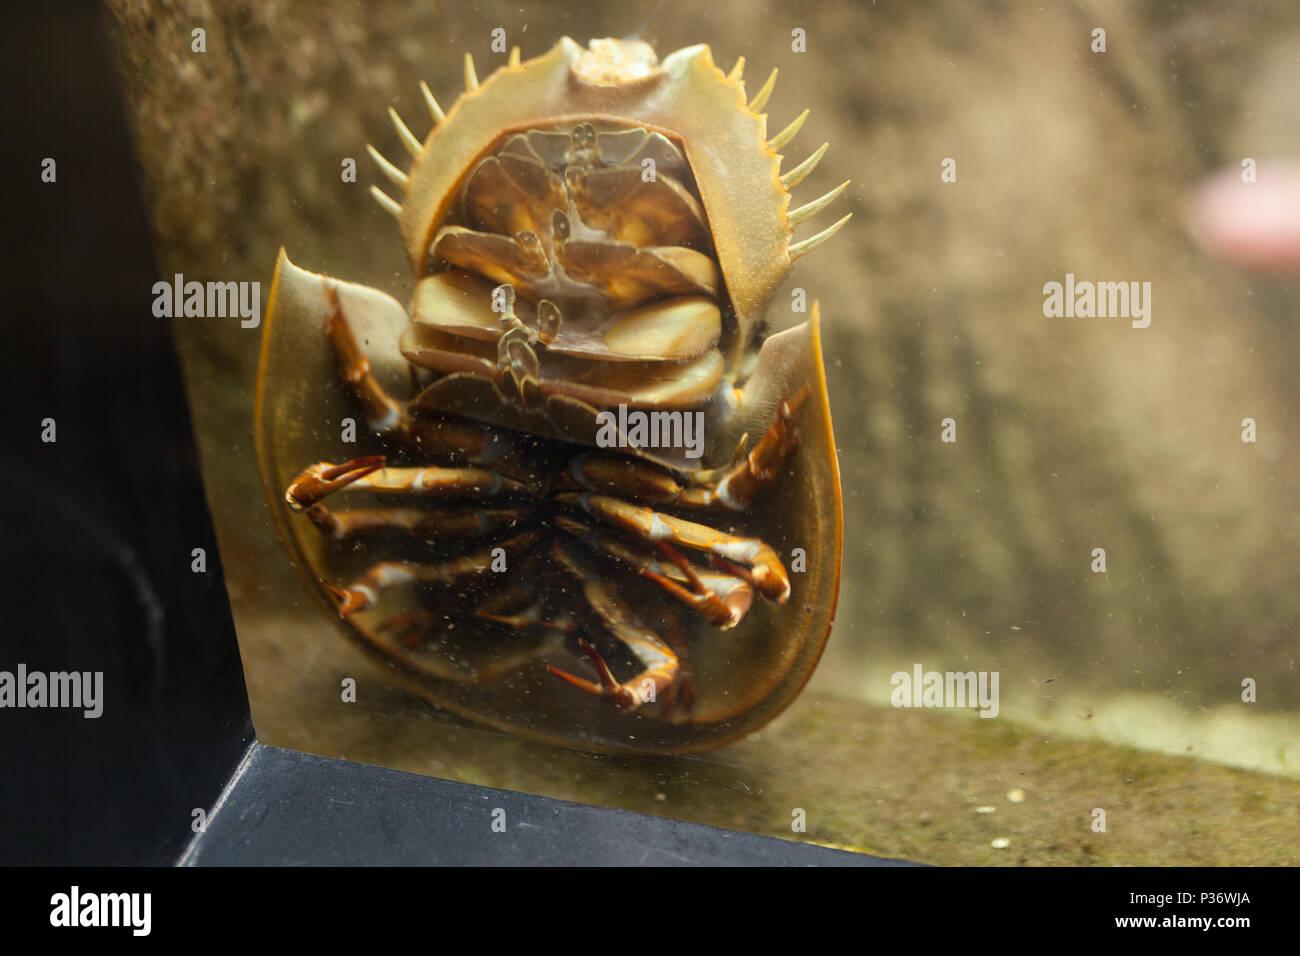 Isopod Stockfotos & Isopod Bilder - Seite 2 - Alamy